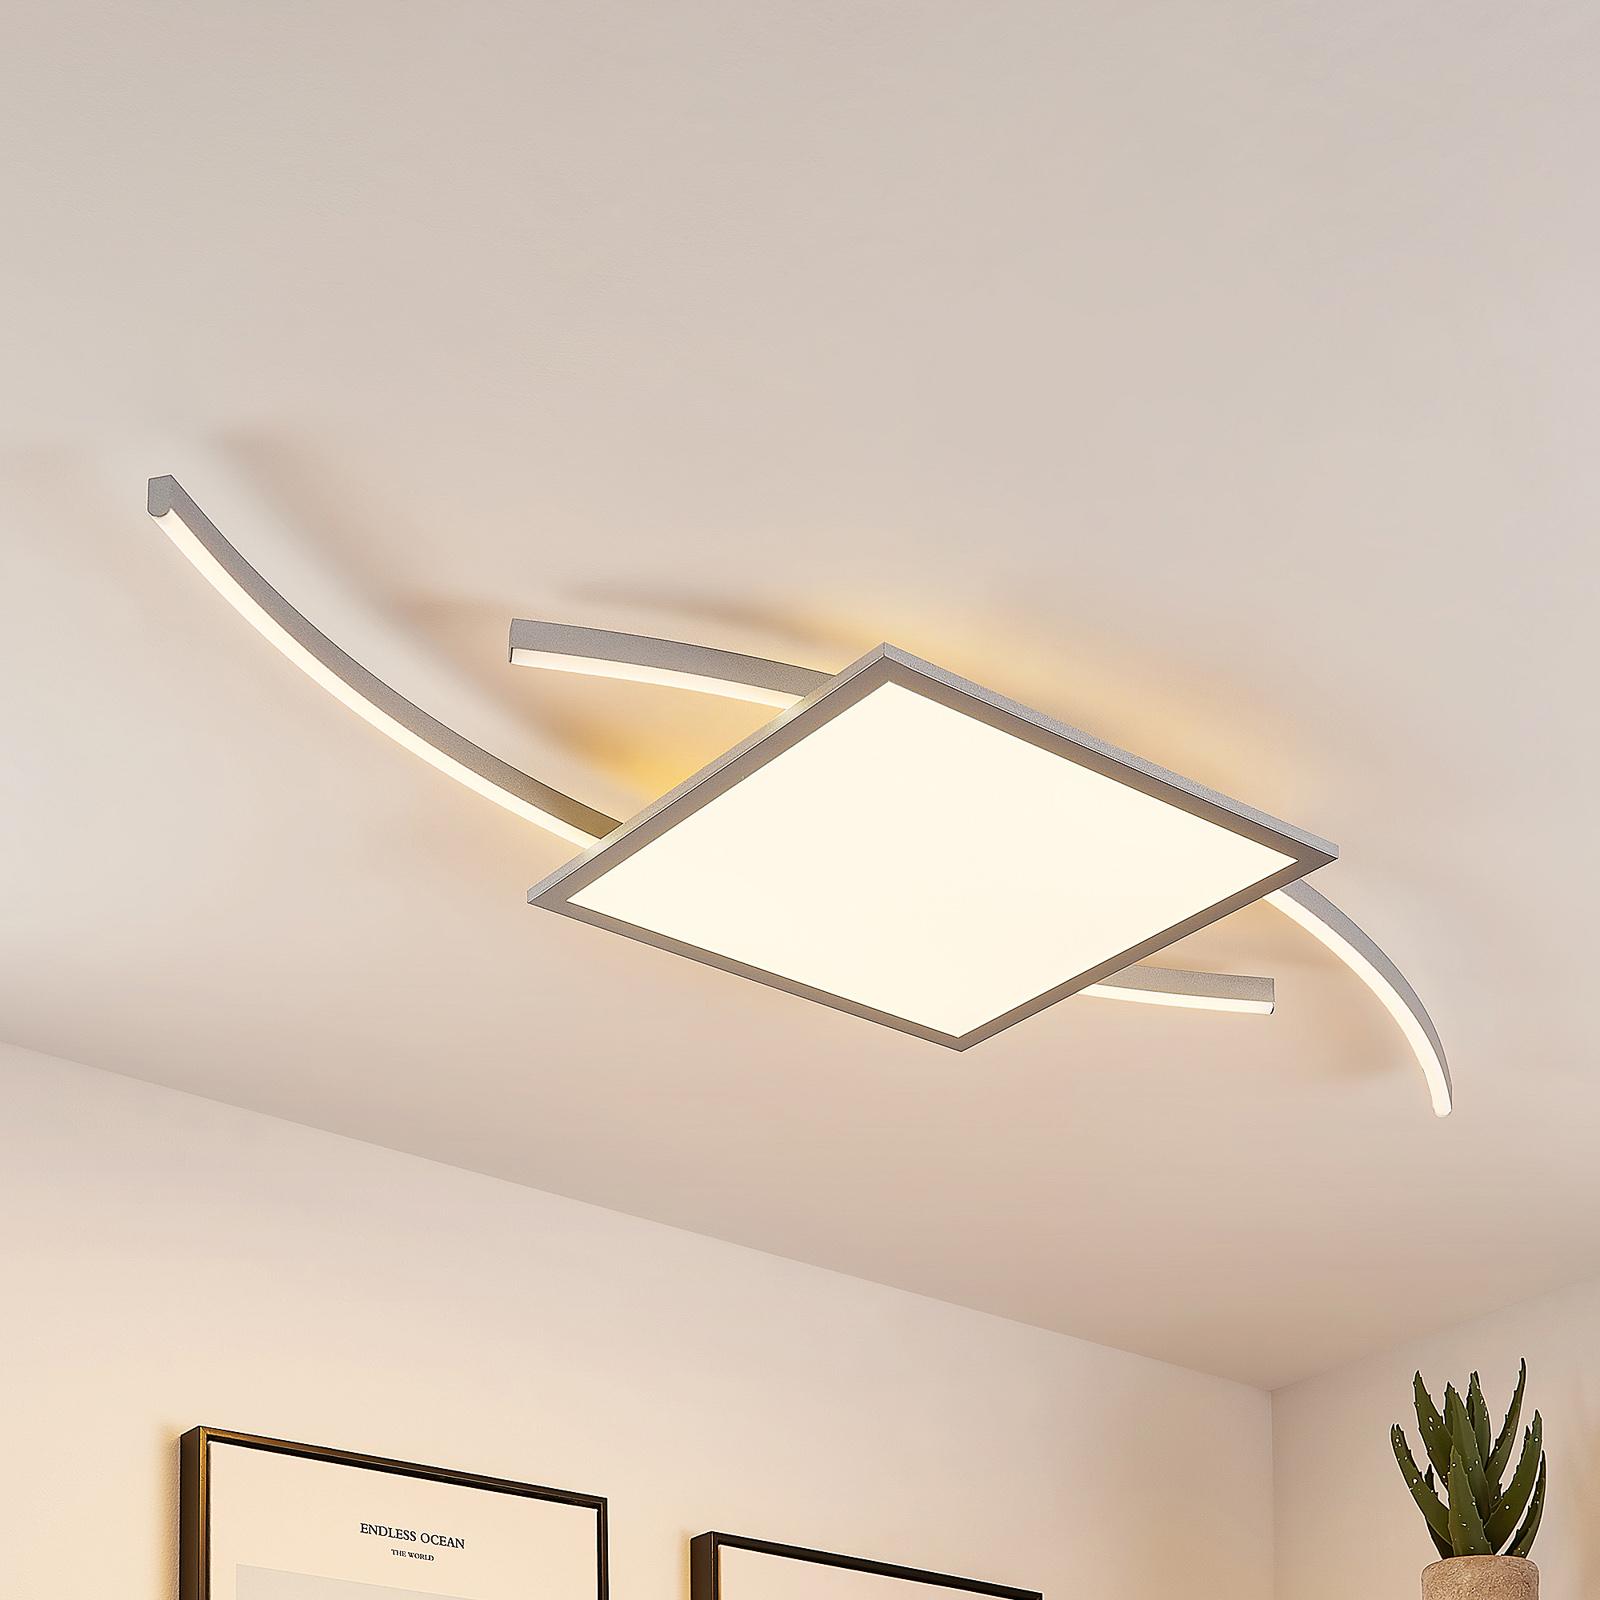 Lucande Tiaro lampa sufitowa LED kątowa 40cm CCT